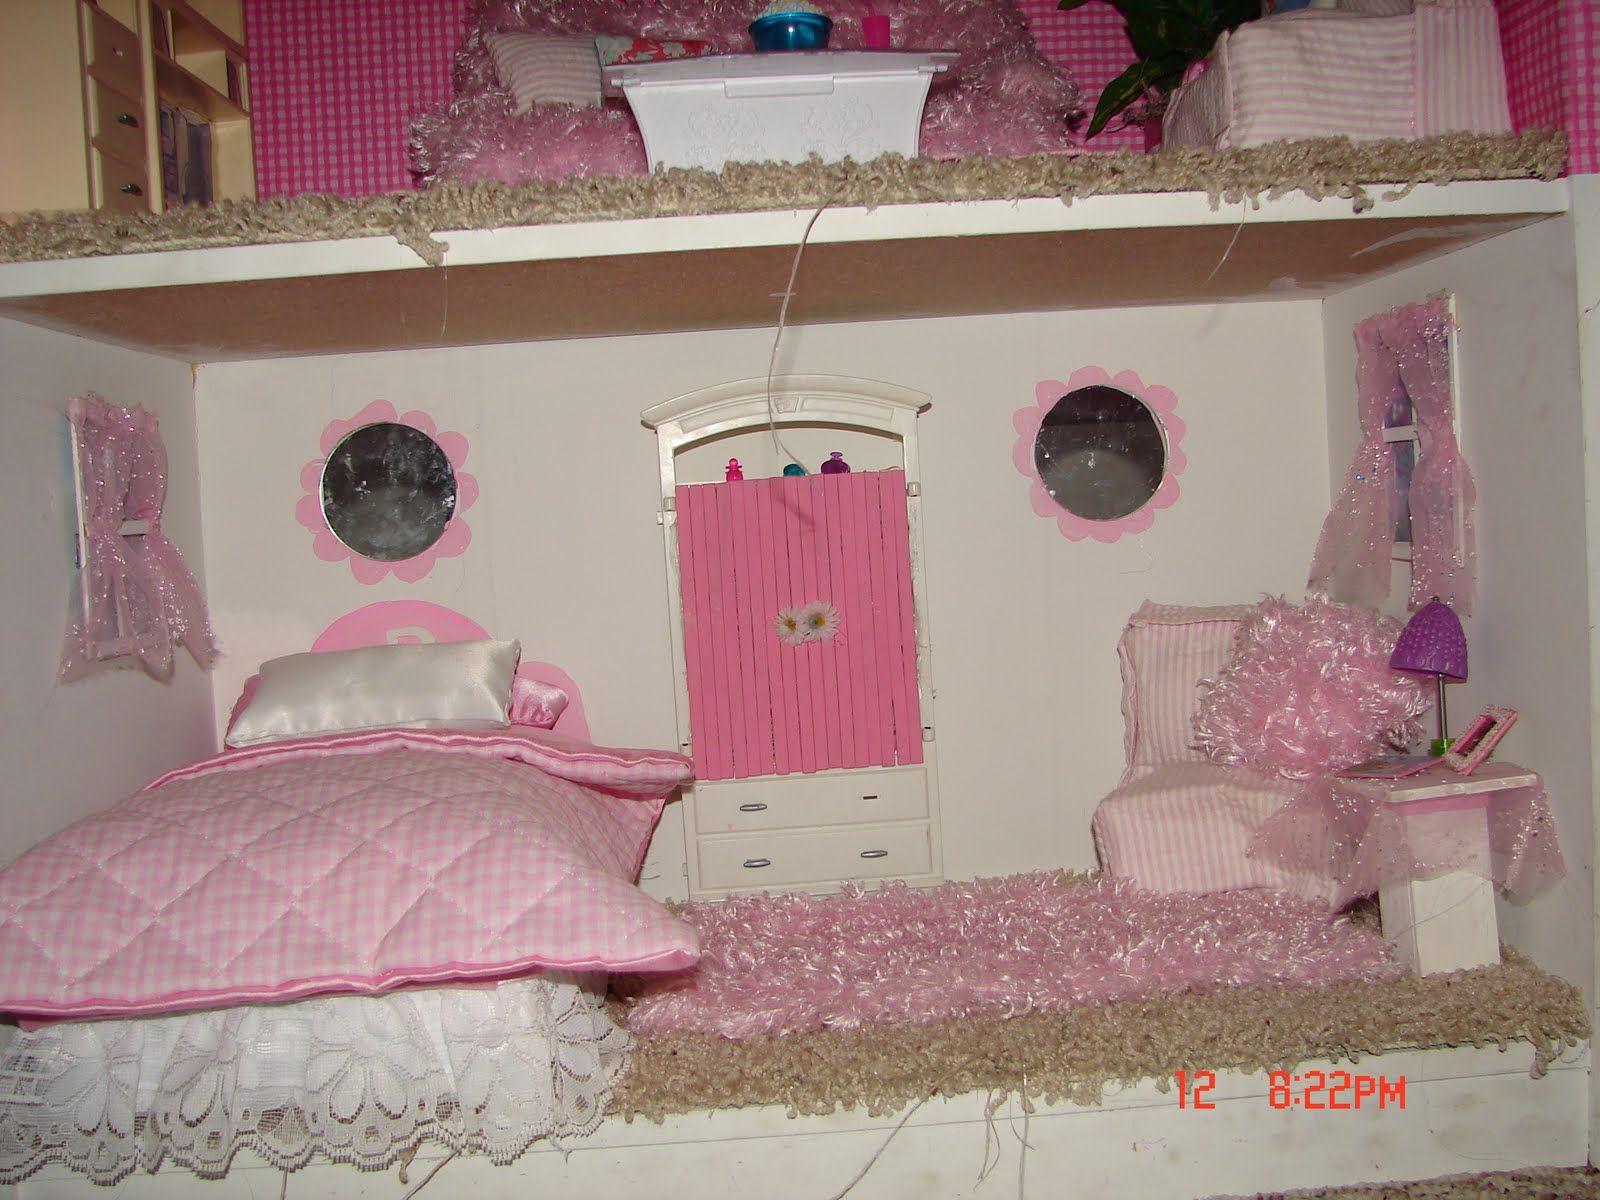 DSC00184JPG 16001200 Barbie FurnitureDollhouse DSC00184JPG